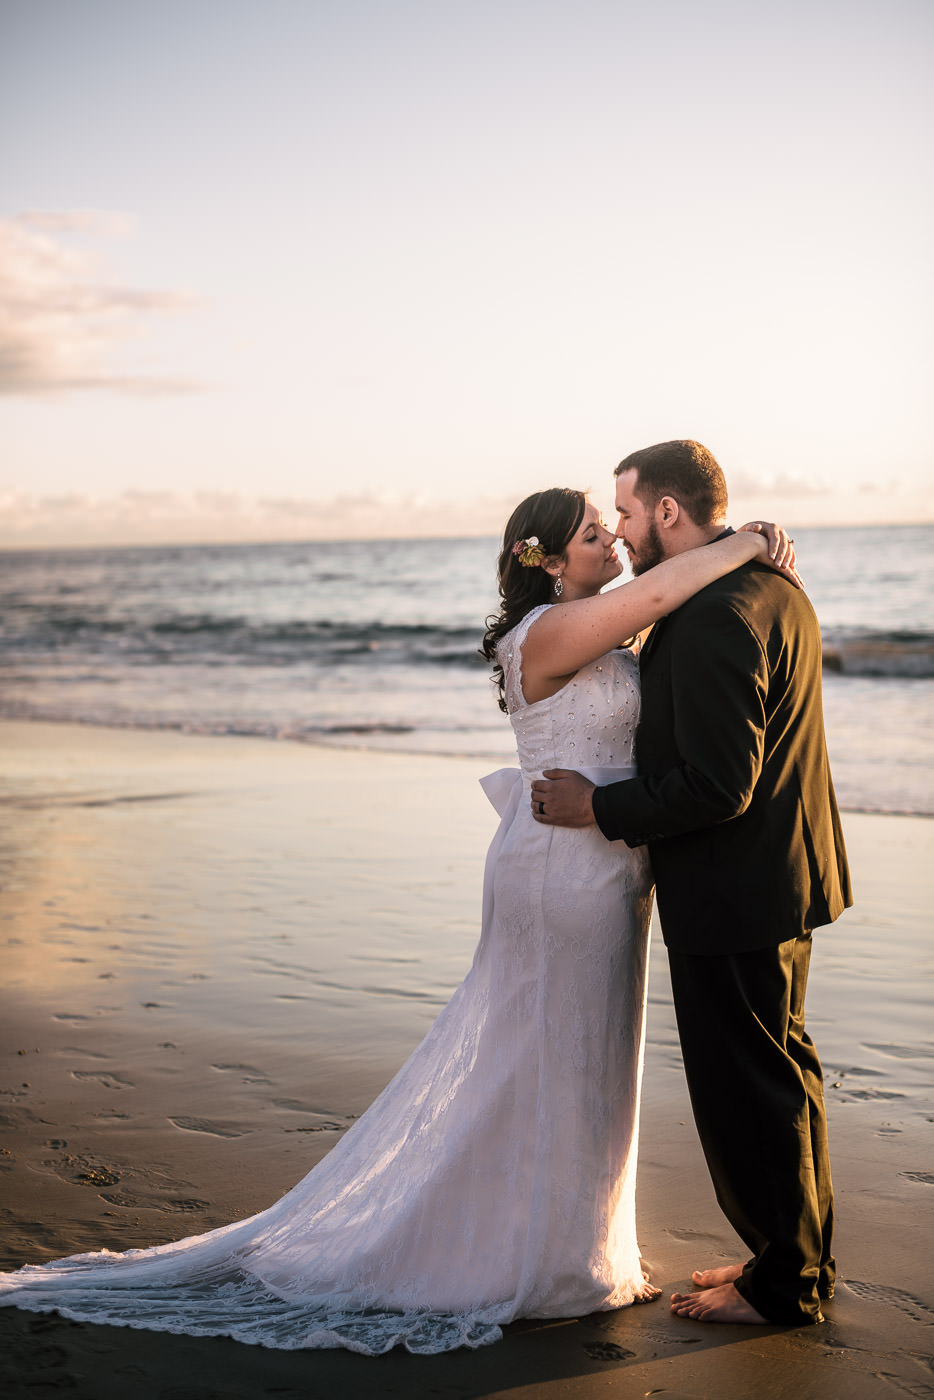 Couple kisses on the wet sand of Laguna Beach at sunset.